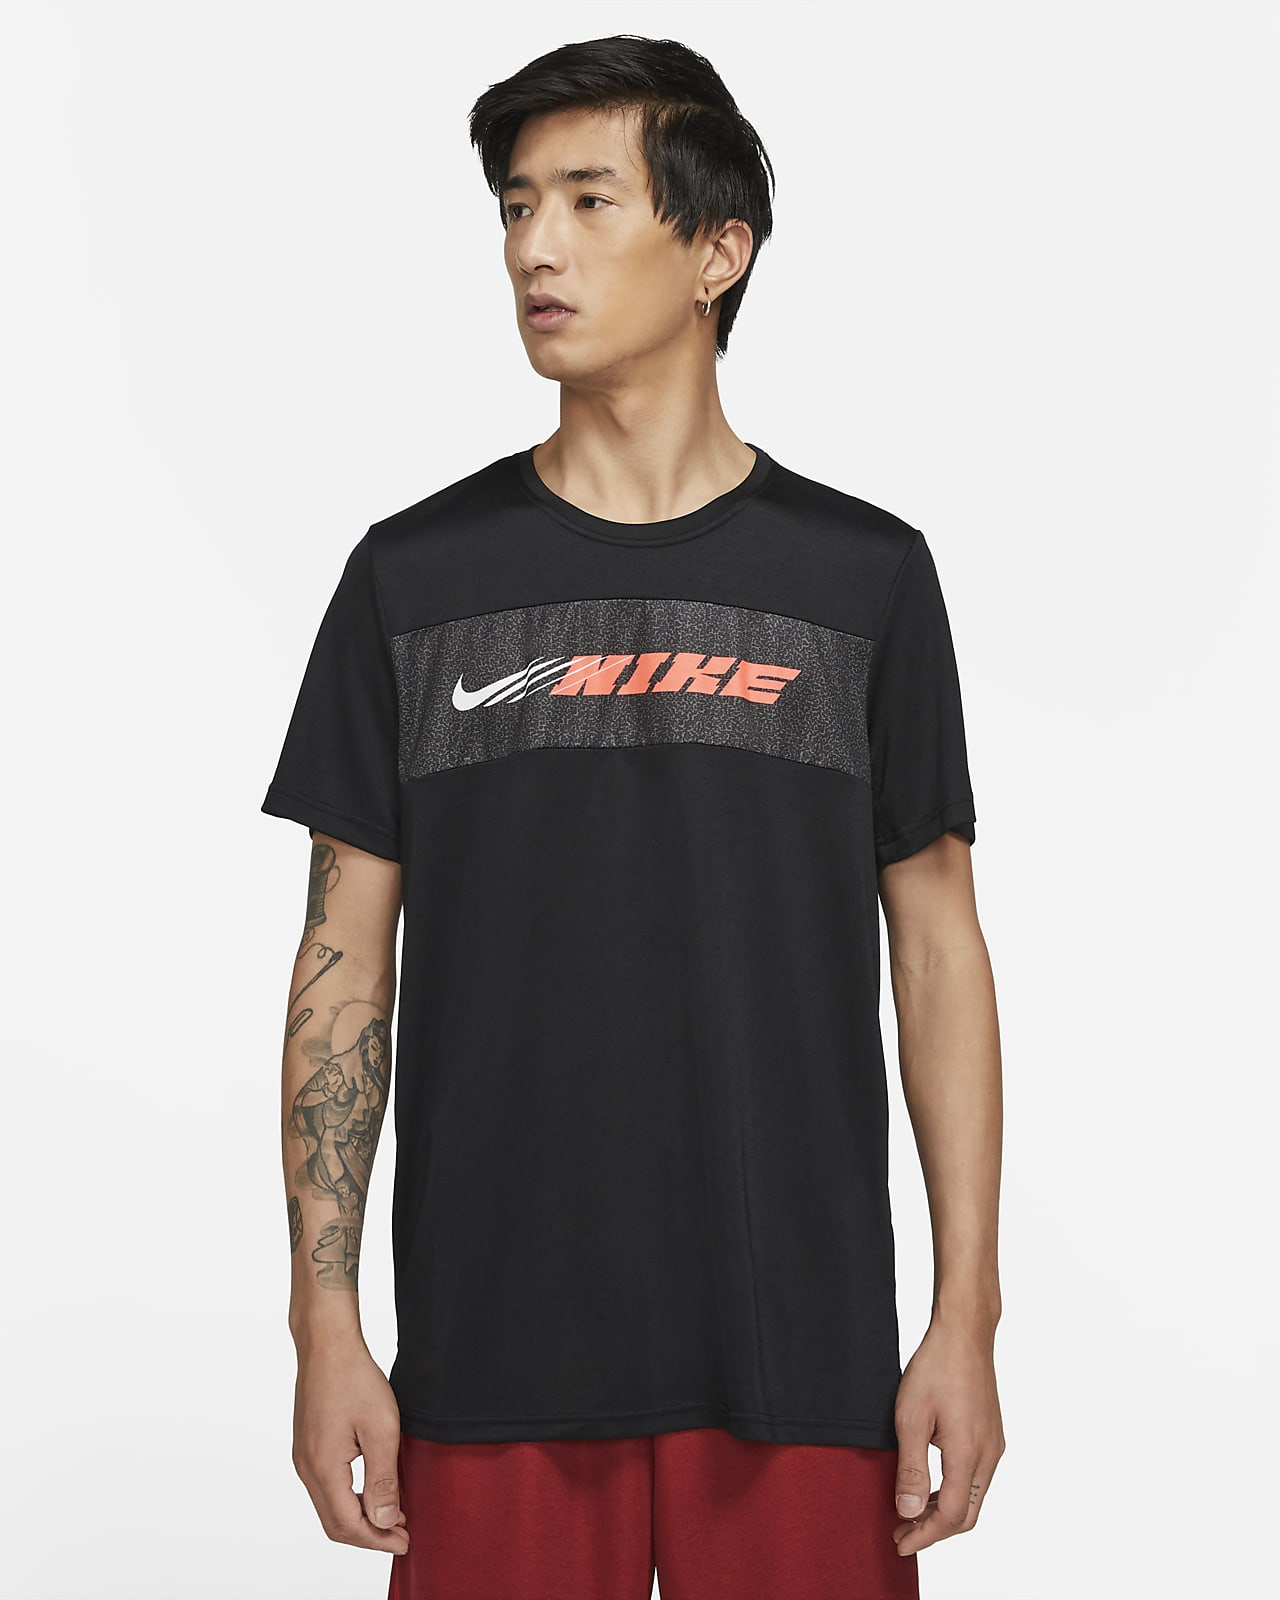 Camiseta de entrenamiento de manga corta para hombre Nike Dri-FIT Superset Sport Clash